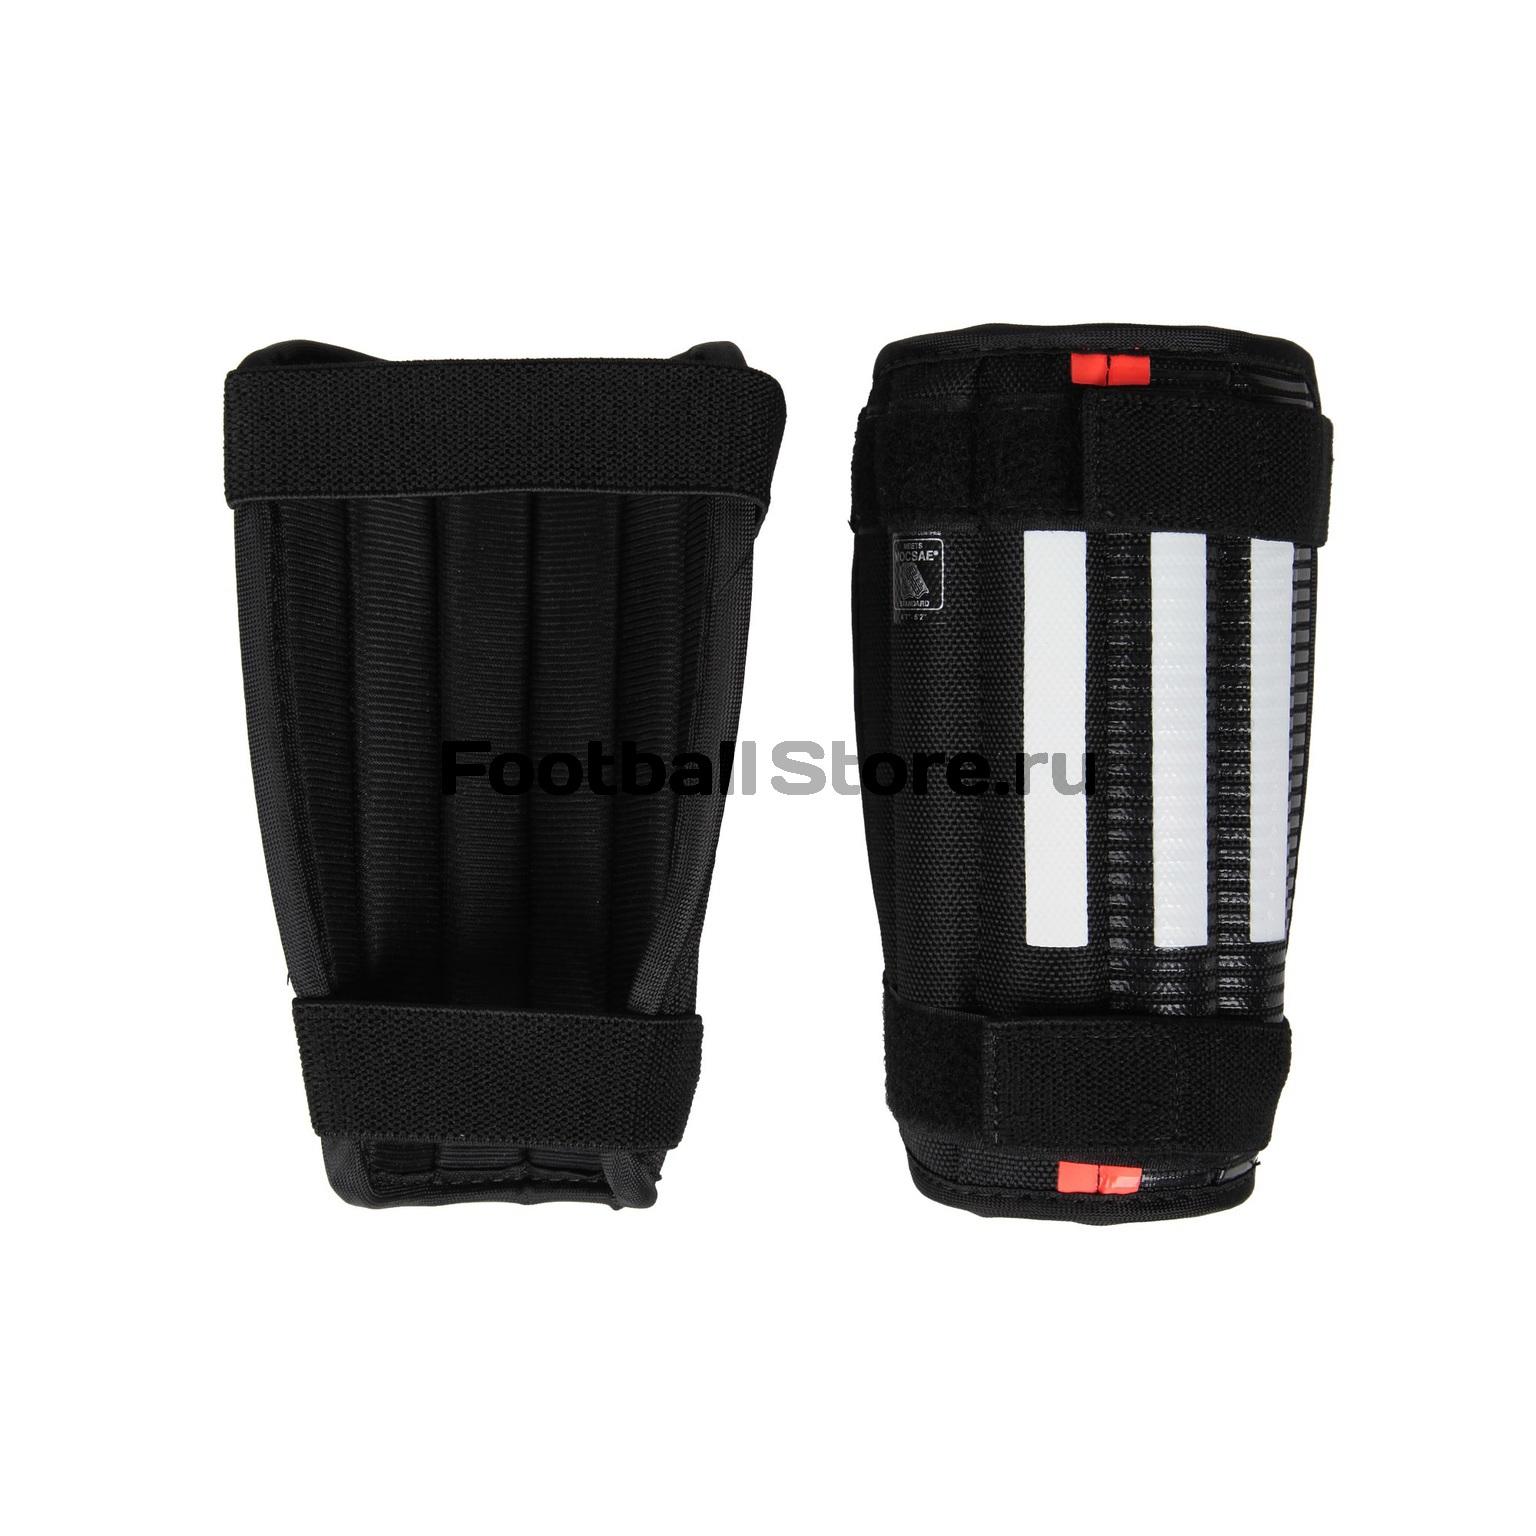 Защита ног Adidas Щитки Adidas 11Anatomic Lite M38630